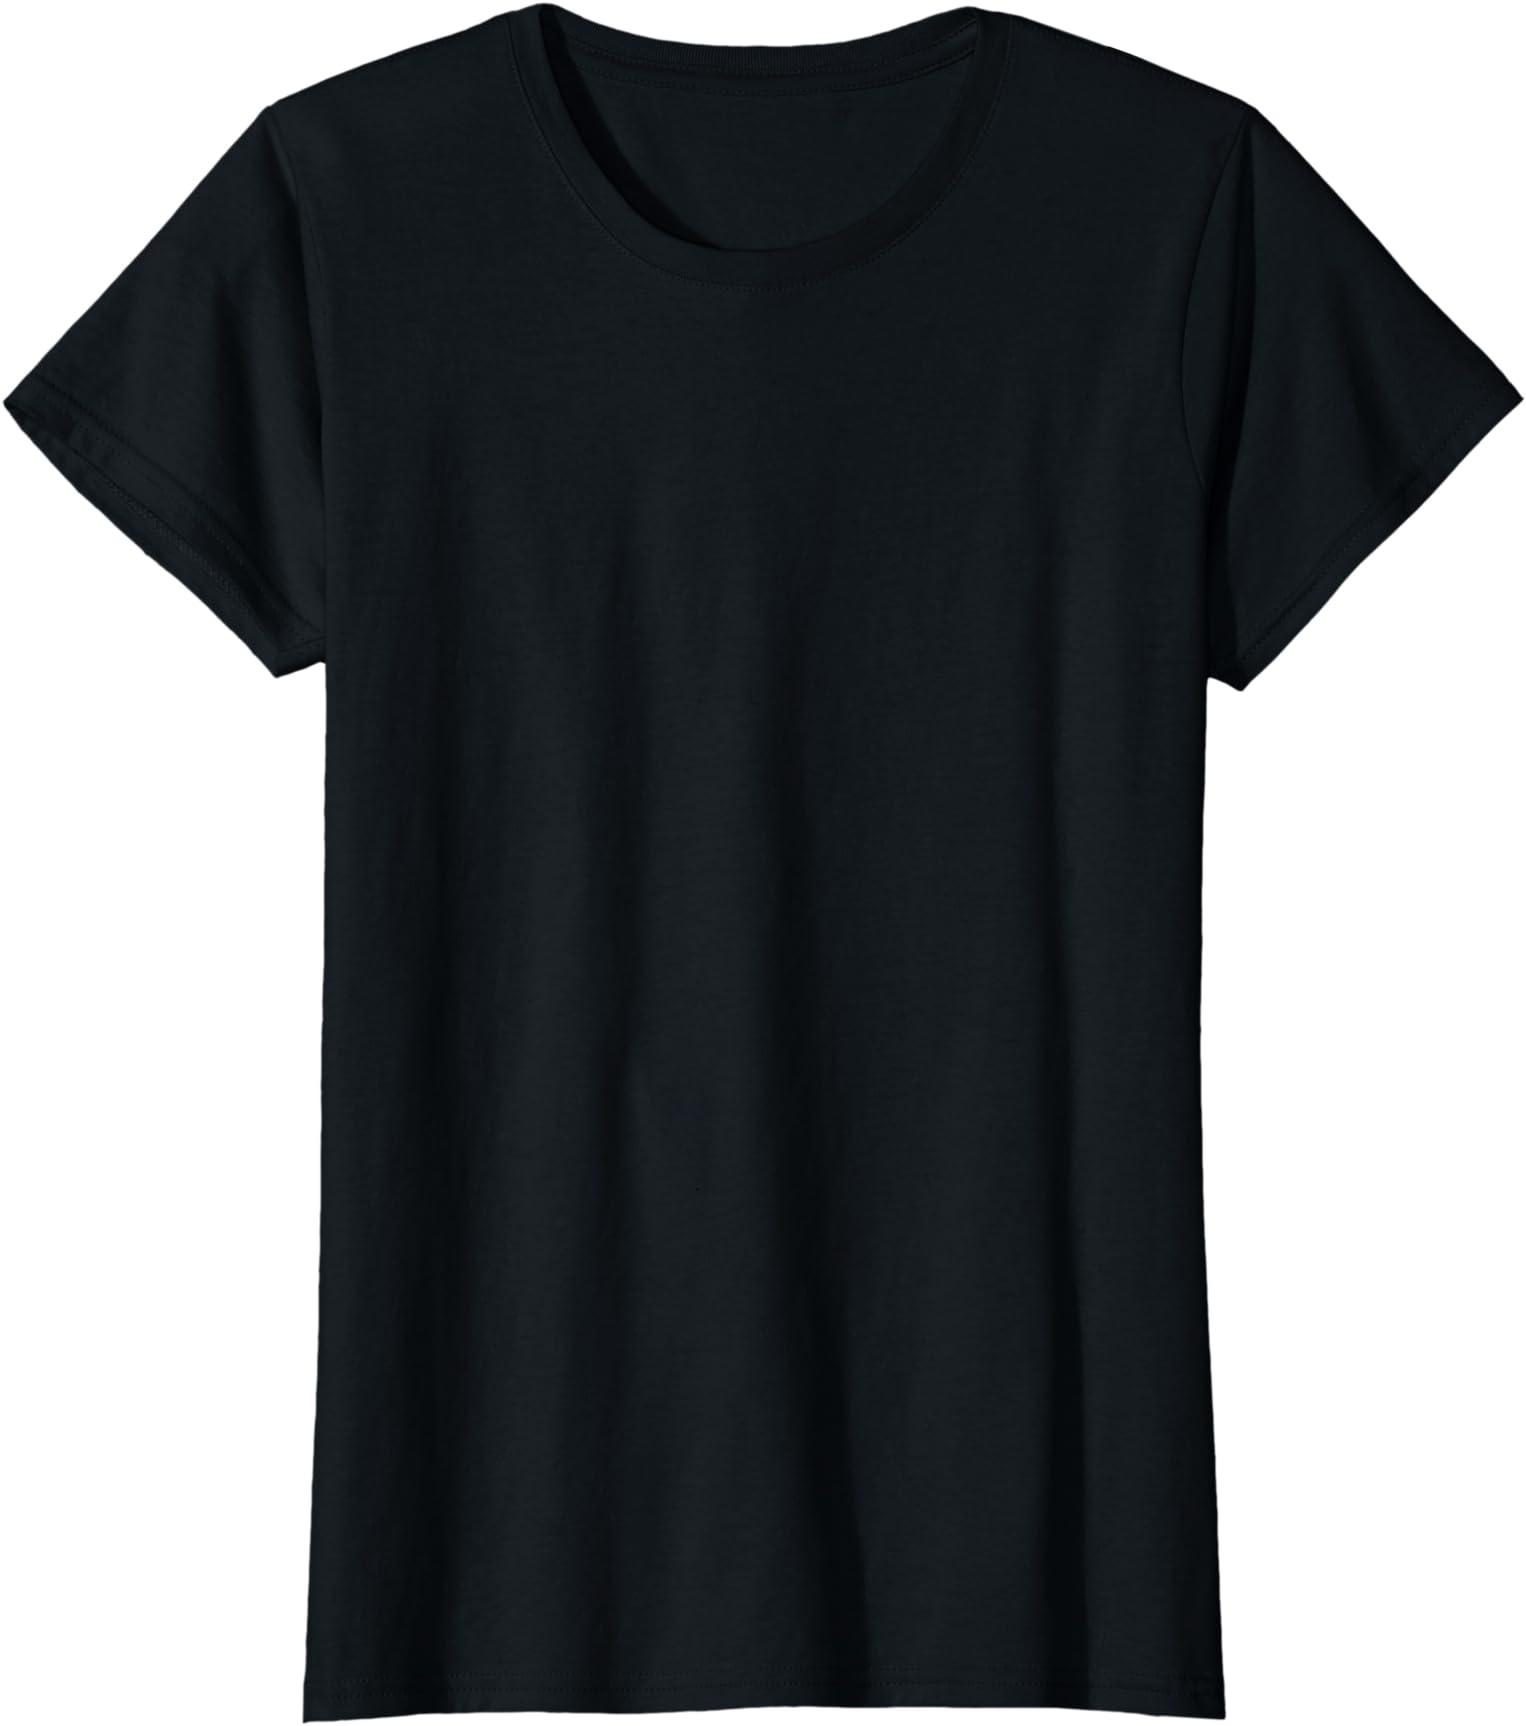 Marvel Black Widow Panels Girls Graphic T Shirt